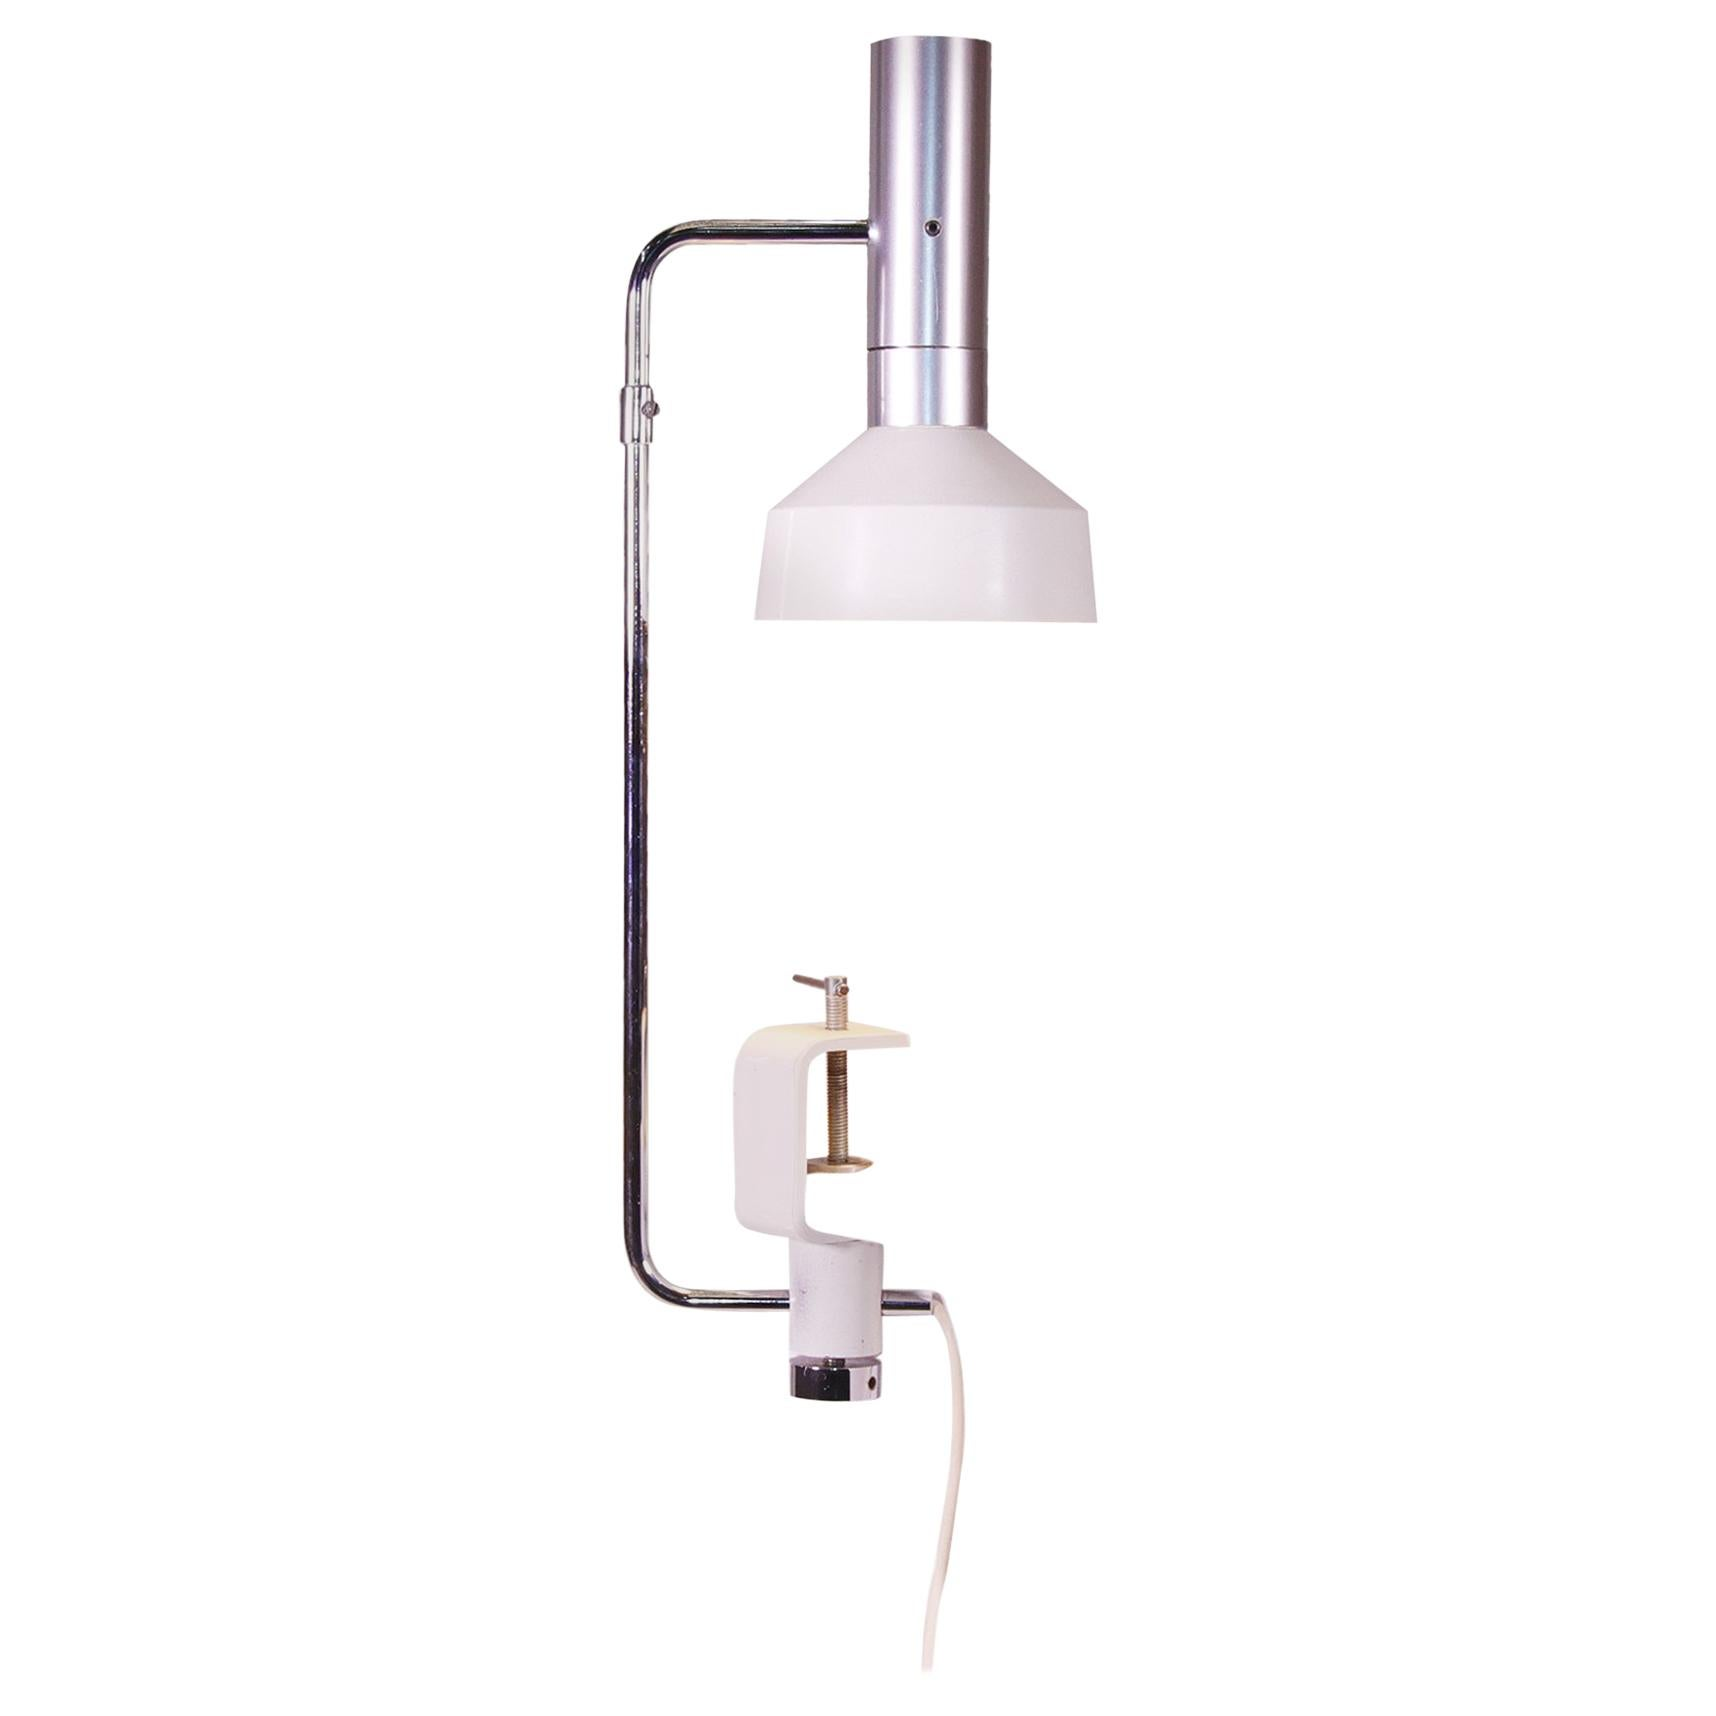 Minilux Desk Clamp Lamp by Rico Baltensweiler, Swiss Made, 1960s